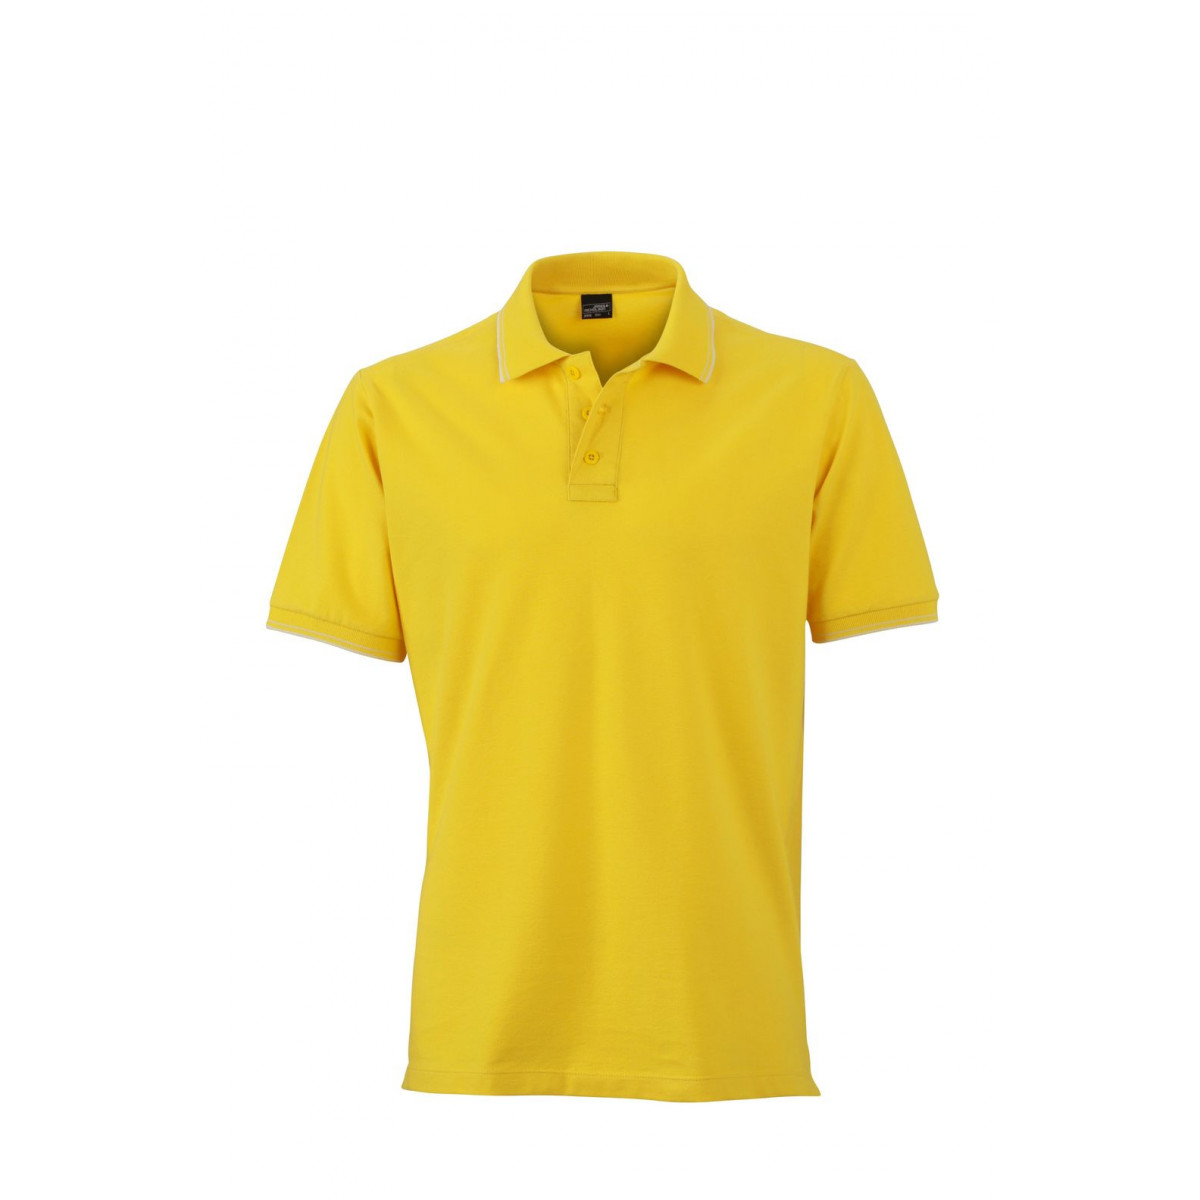 Рубашка поло мужская JN986 Mens Polo - Ярко-желтый/Белый